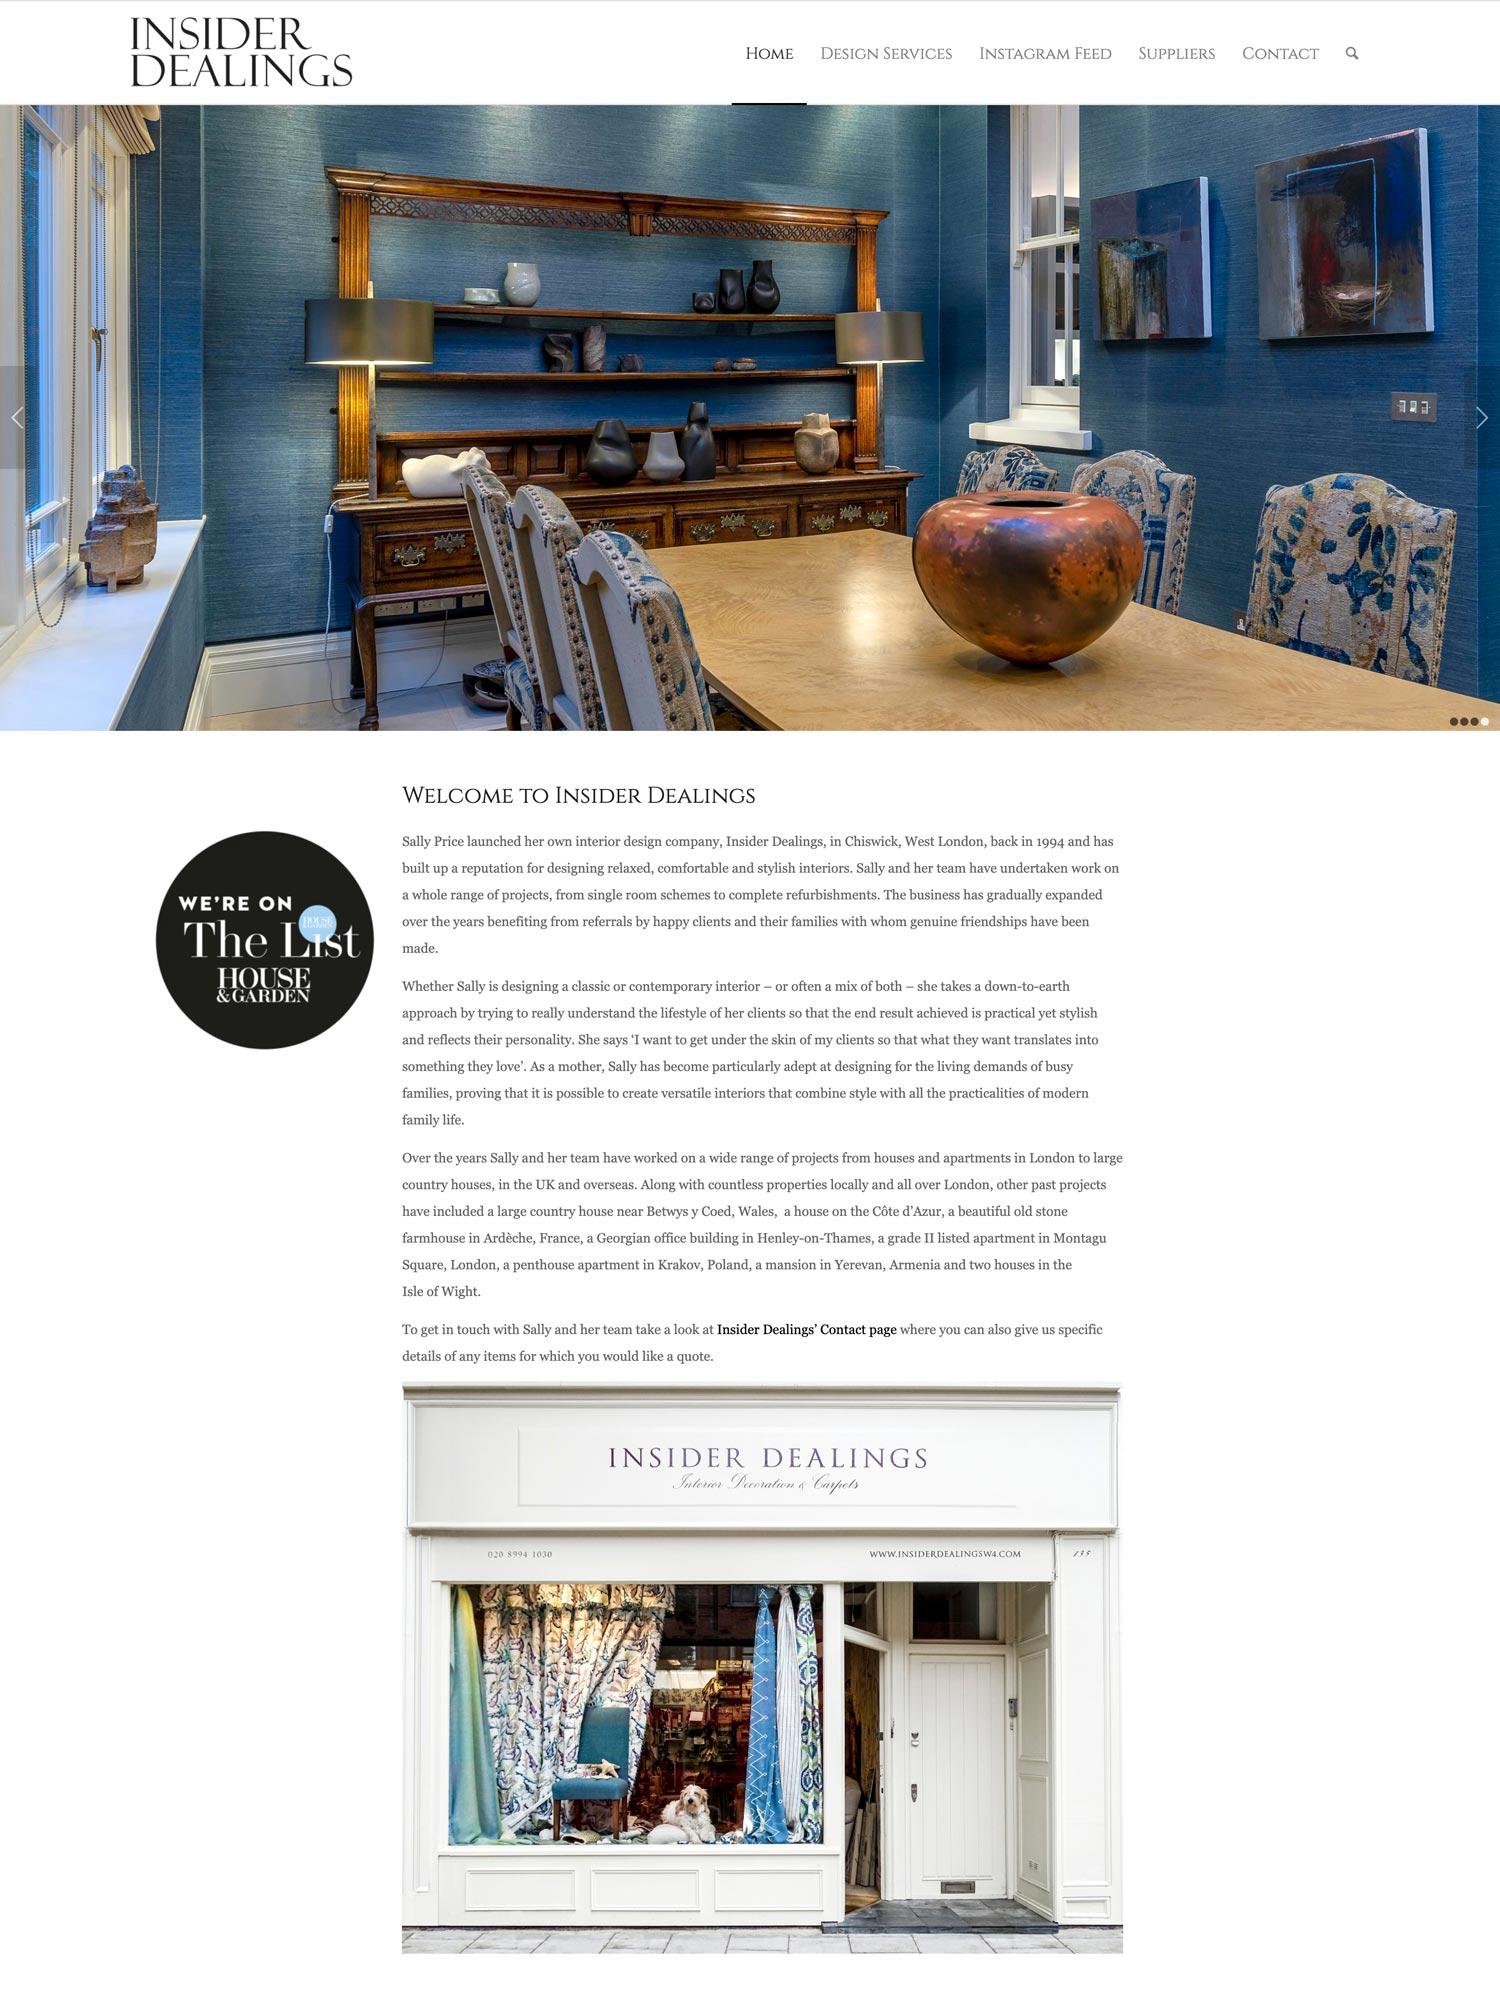 Insider Dealings Website Home 3